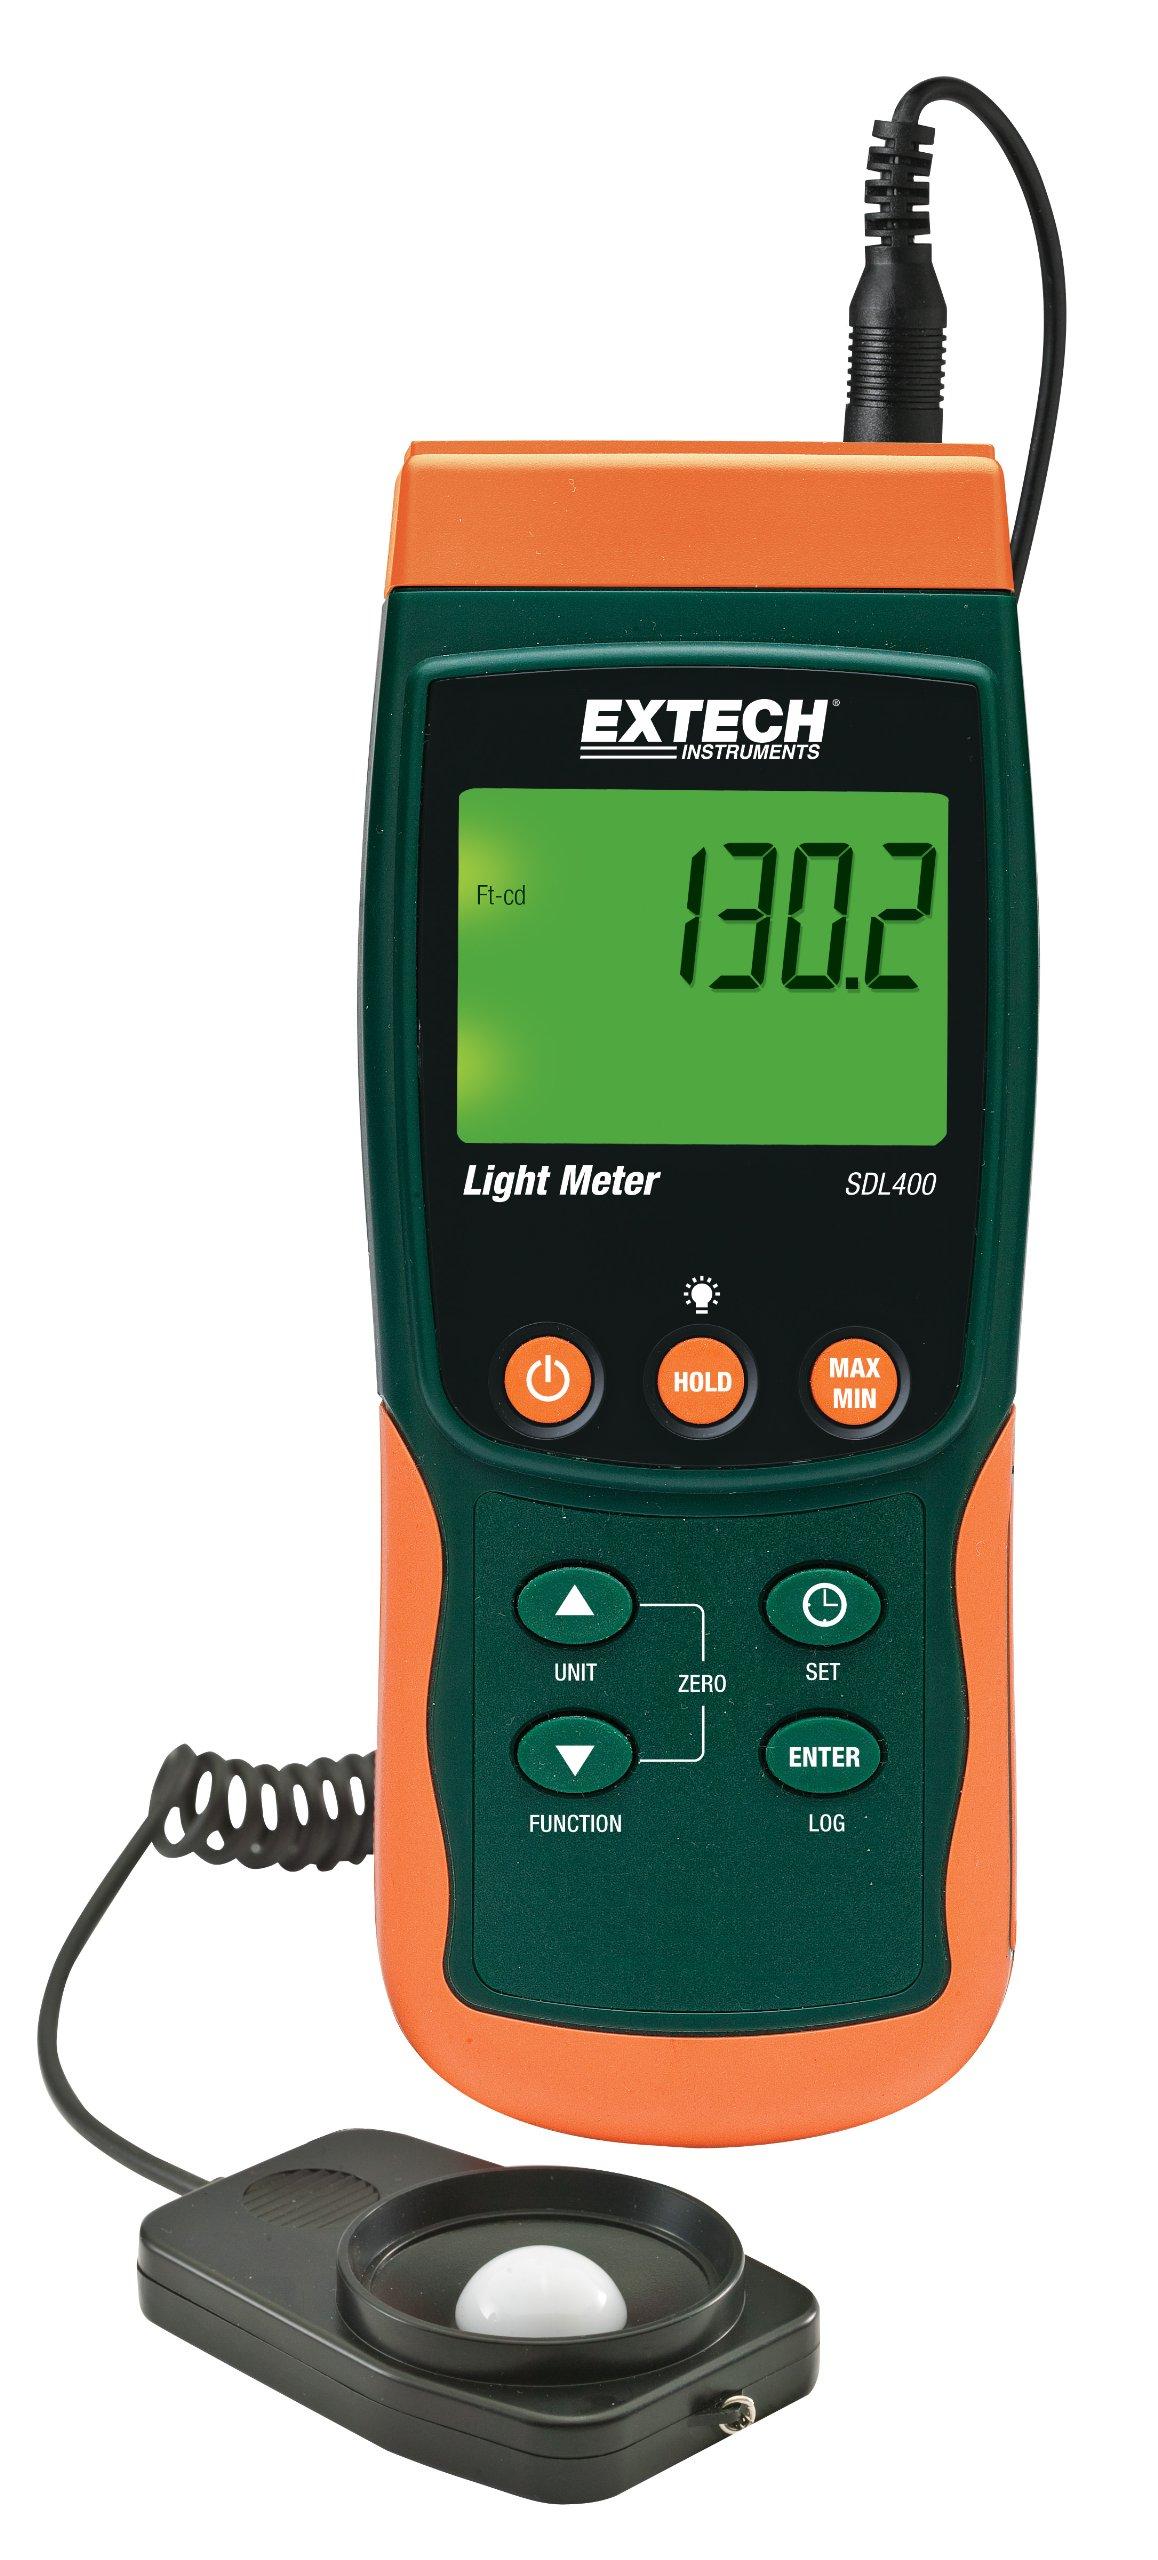 Extech SDL400 Light Meter SD Logger